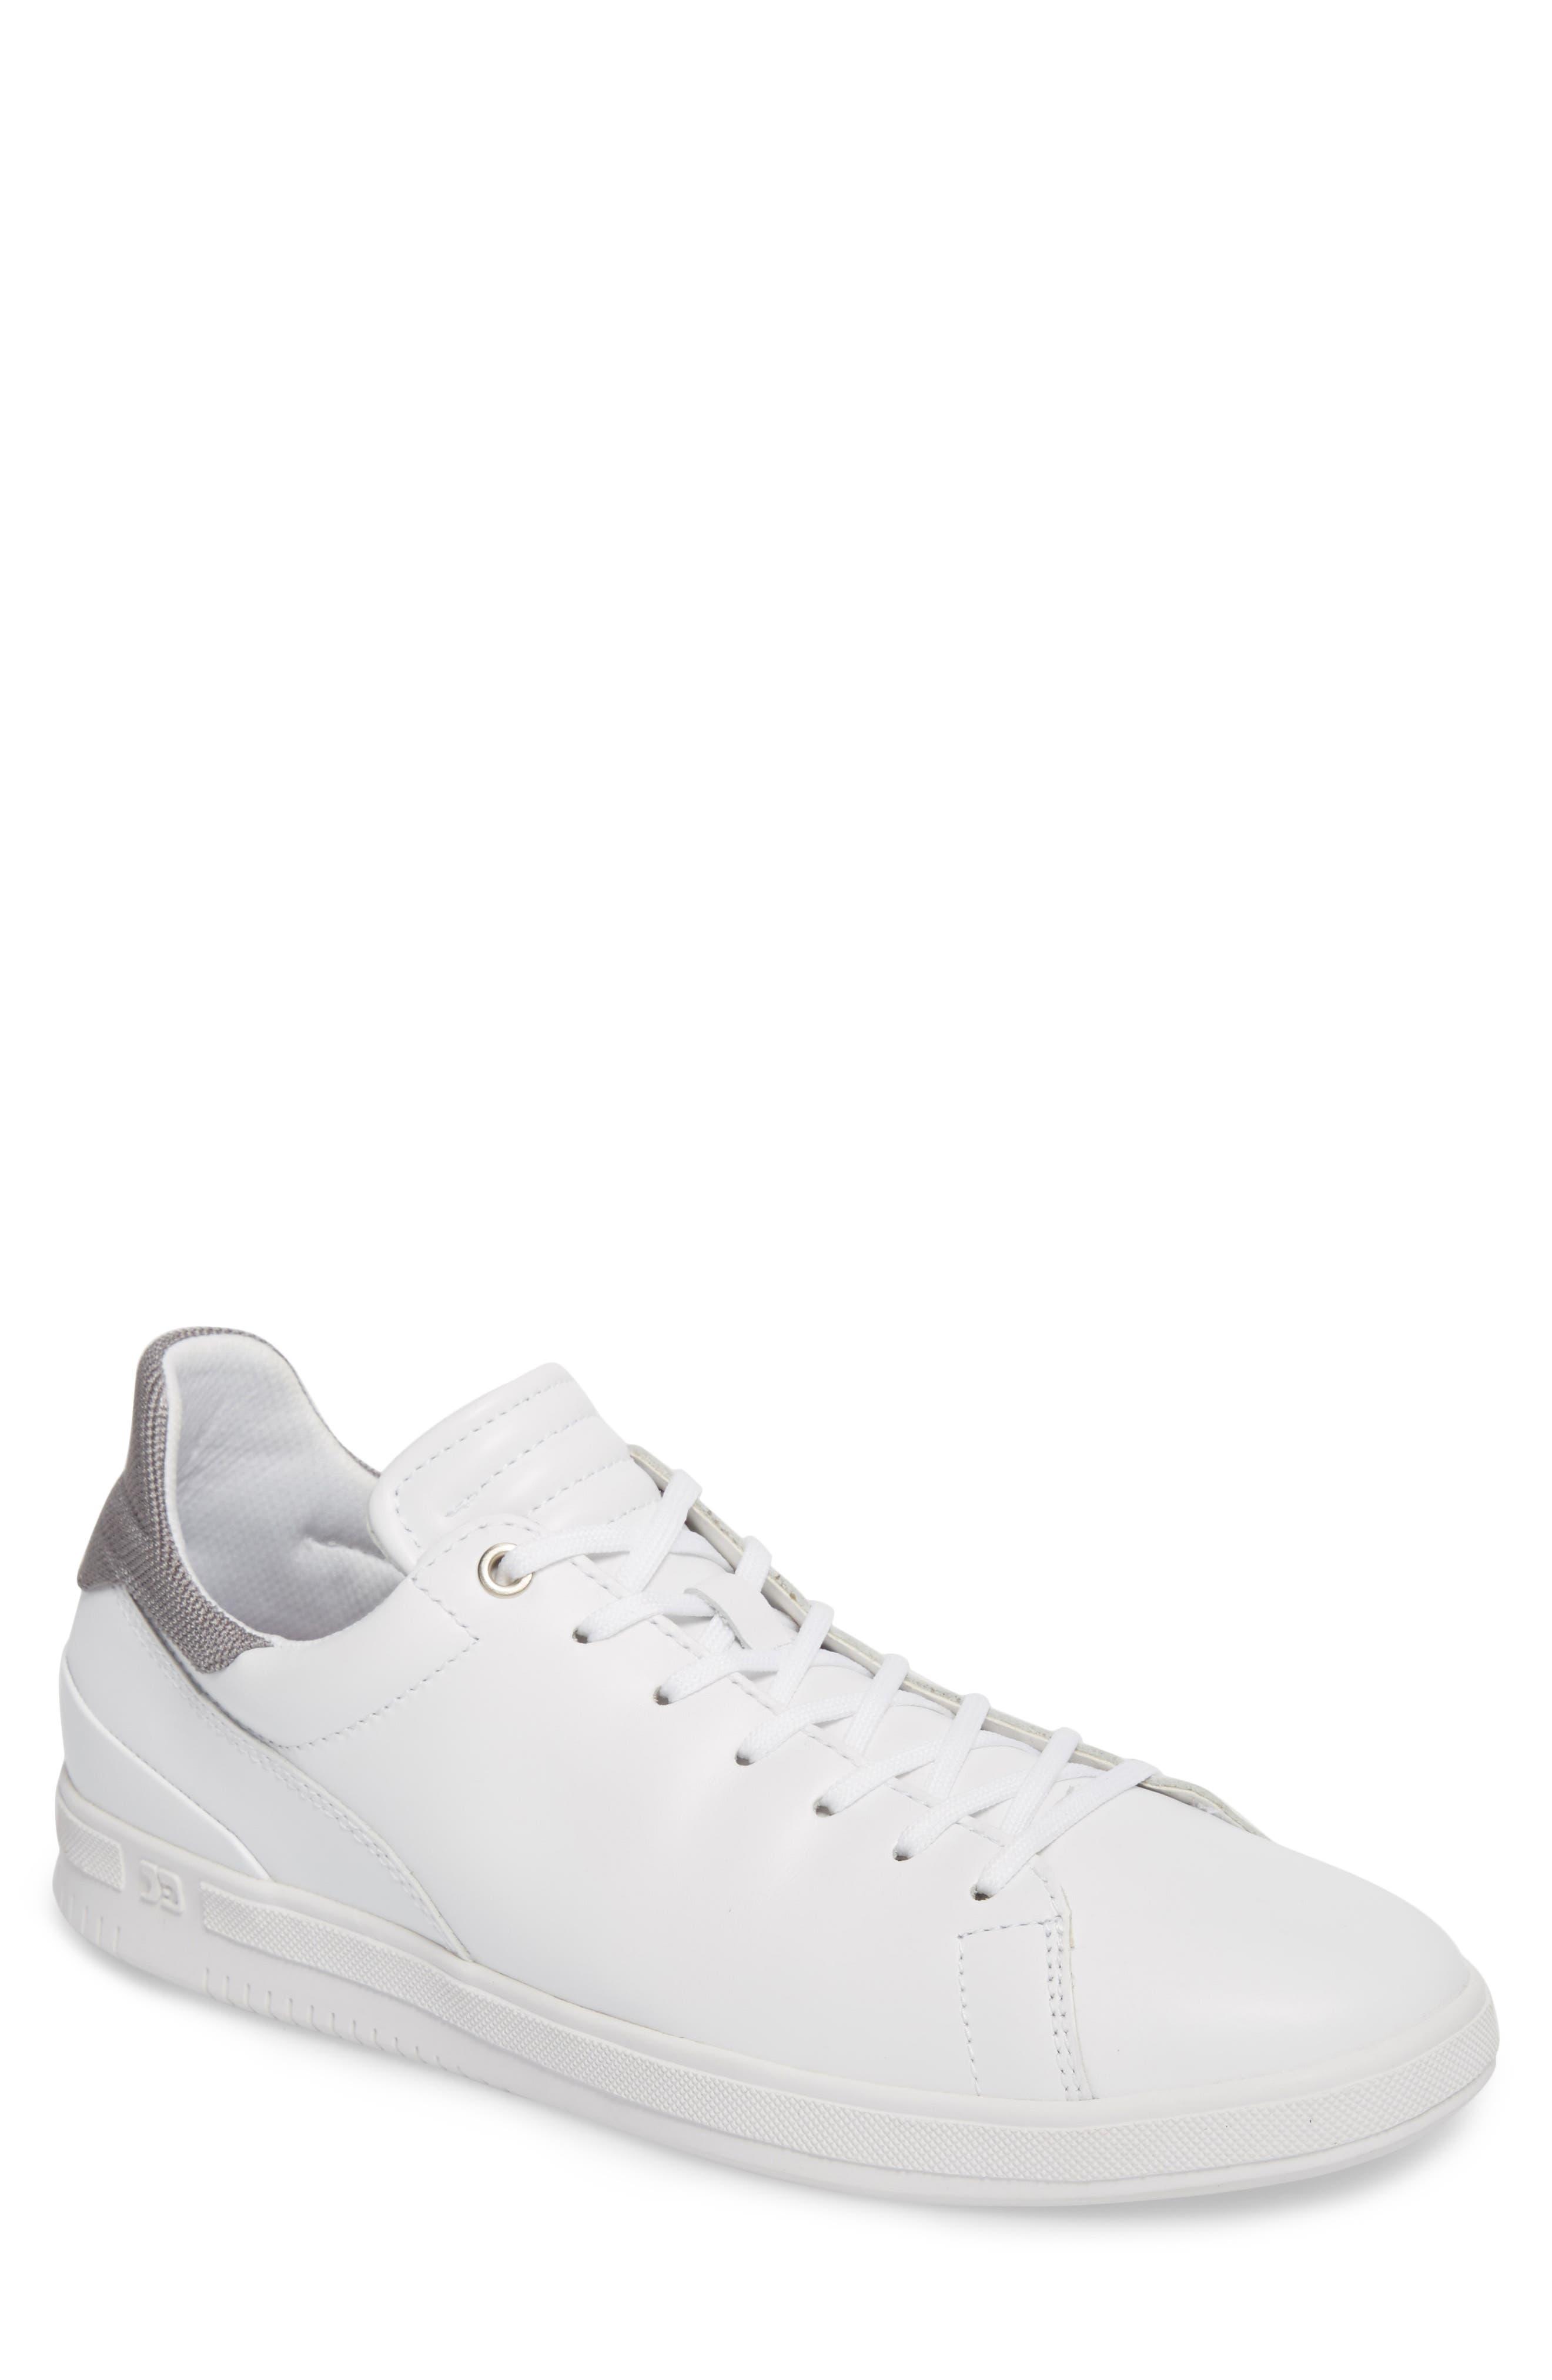 Joe Mama Sneaker,                             Main thumbnail 1, color,                             WHITE LEATHER